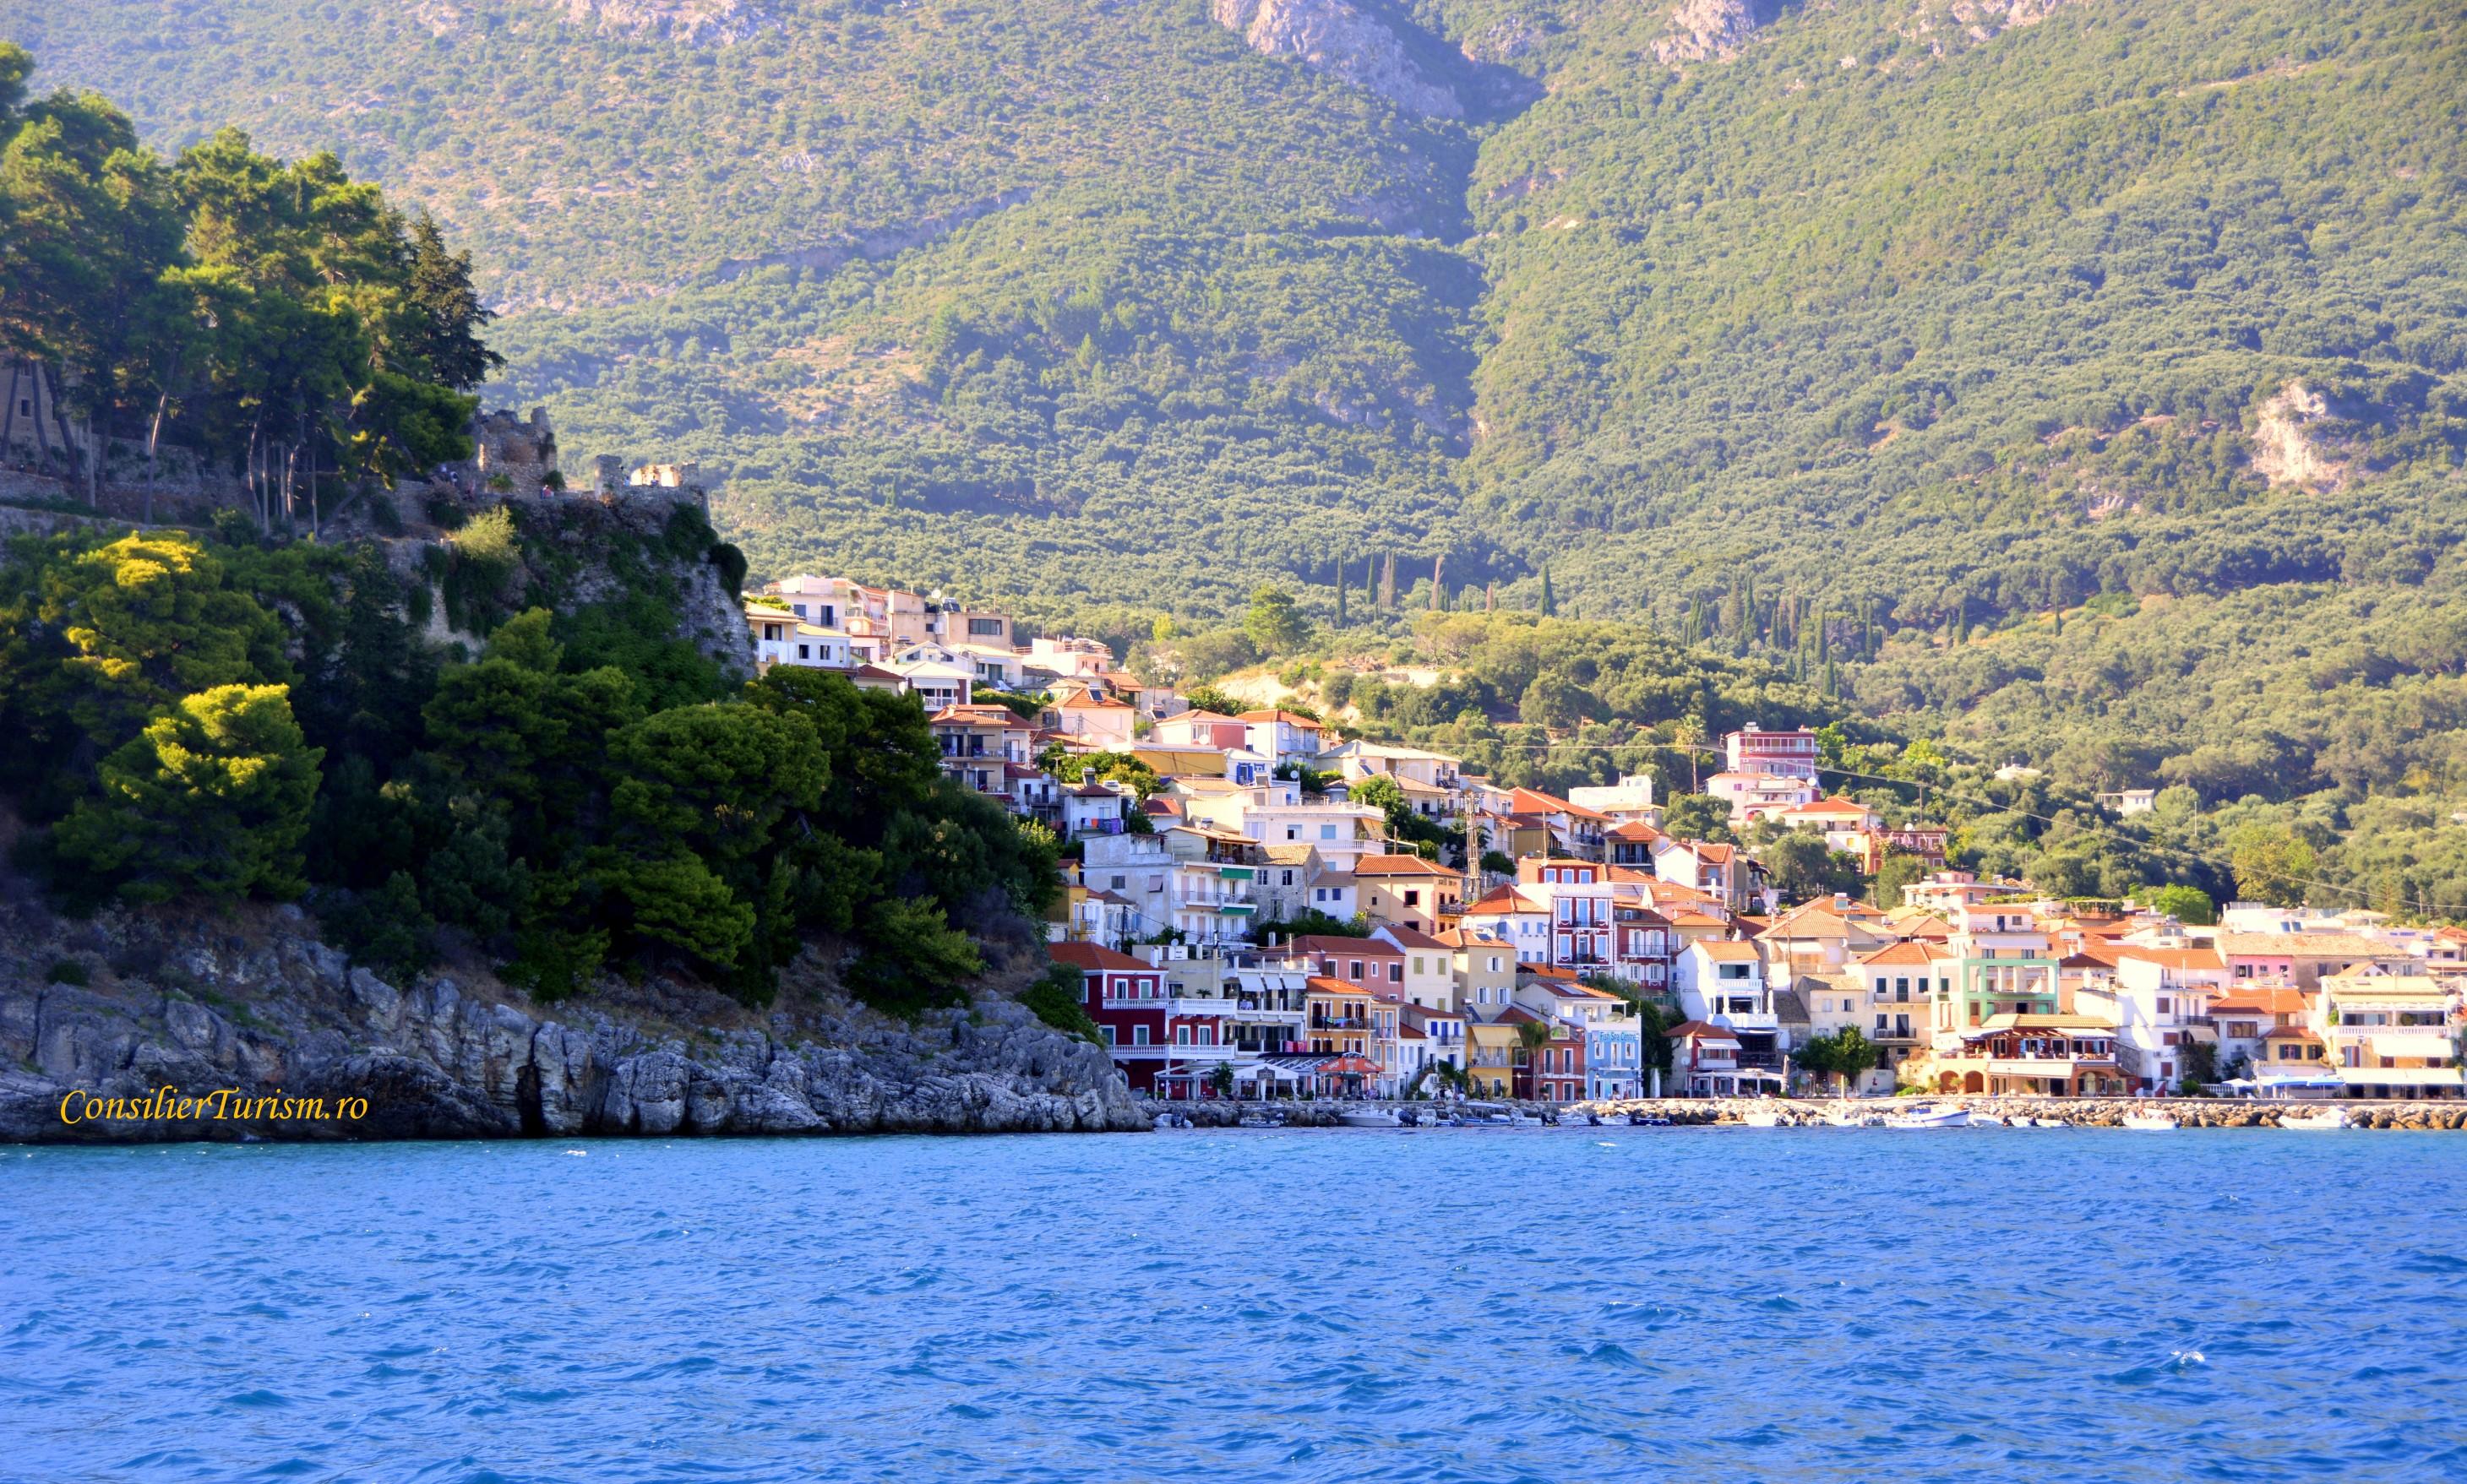 parga greece sea view